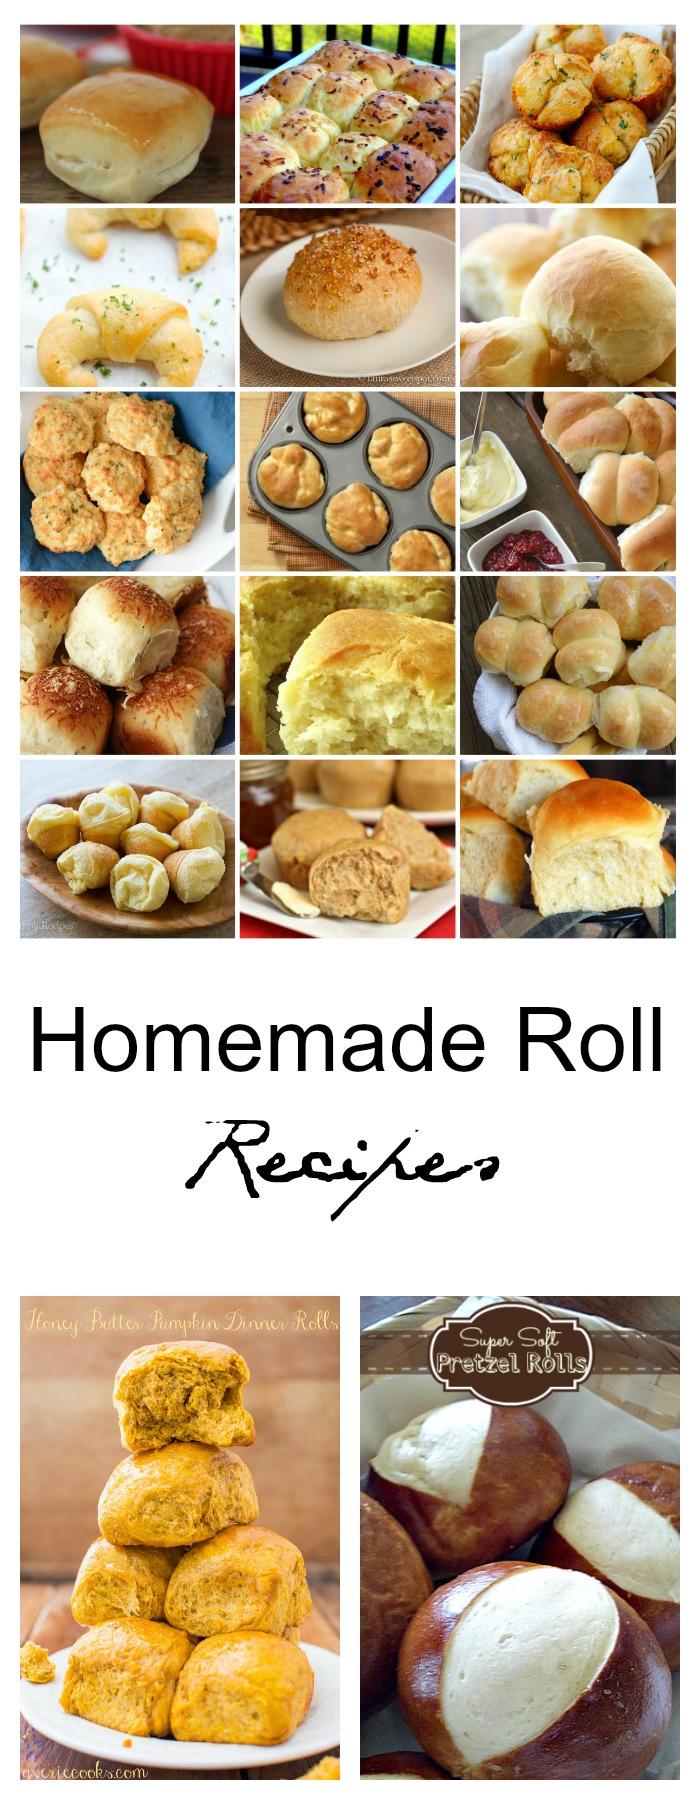 Homemade-Roll-Recipes-Pin